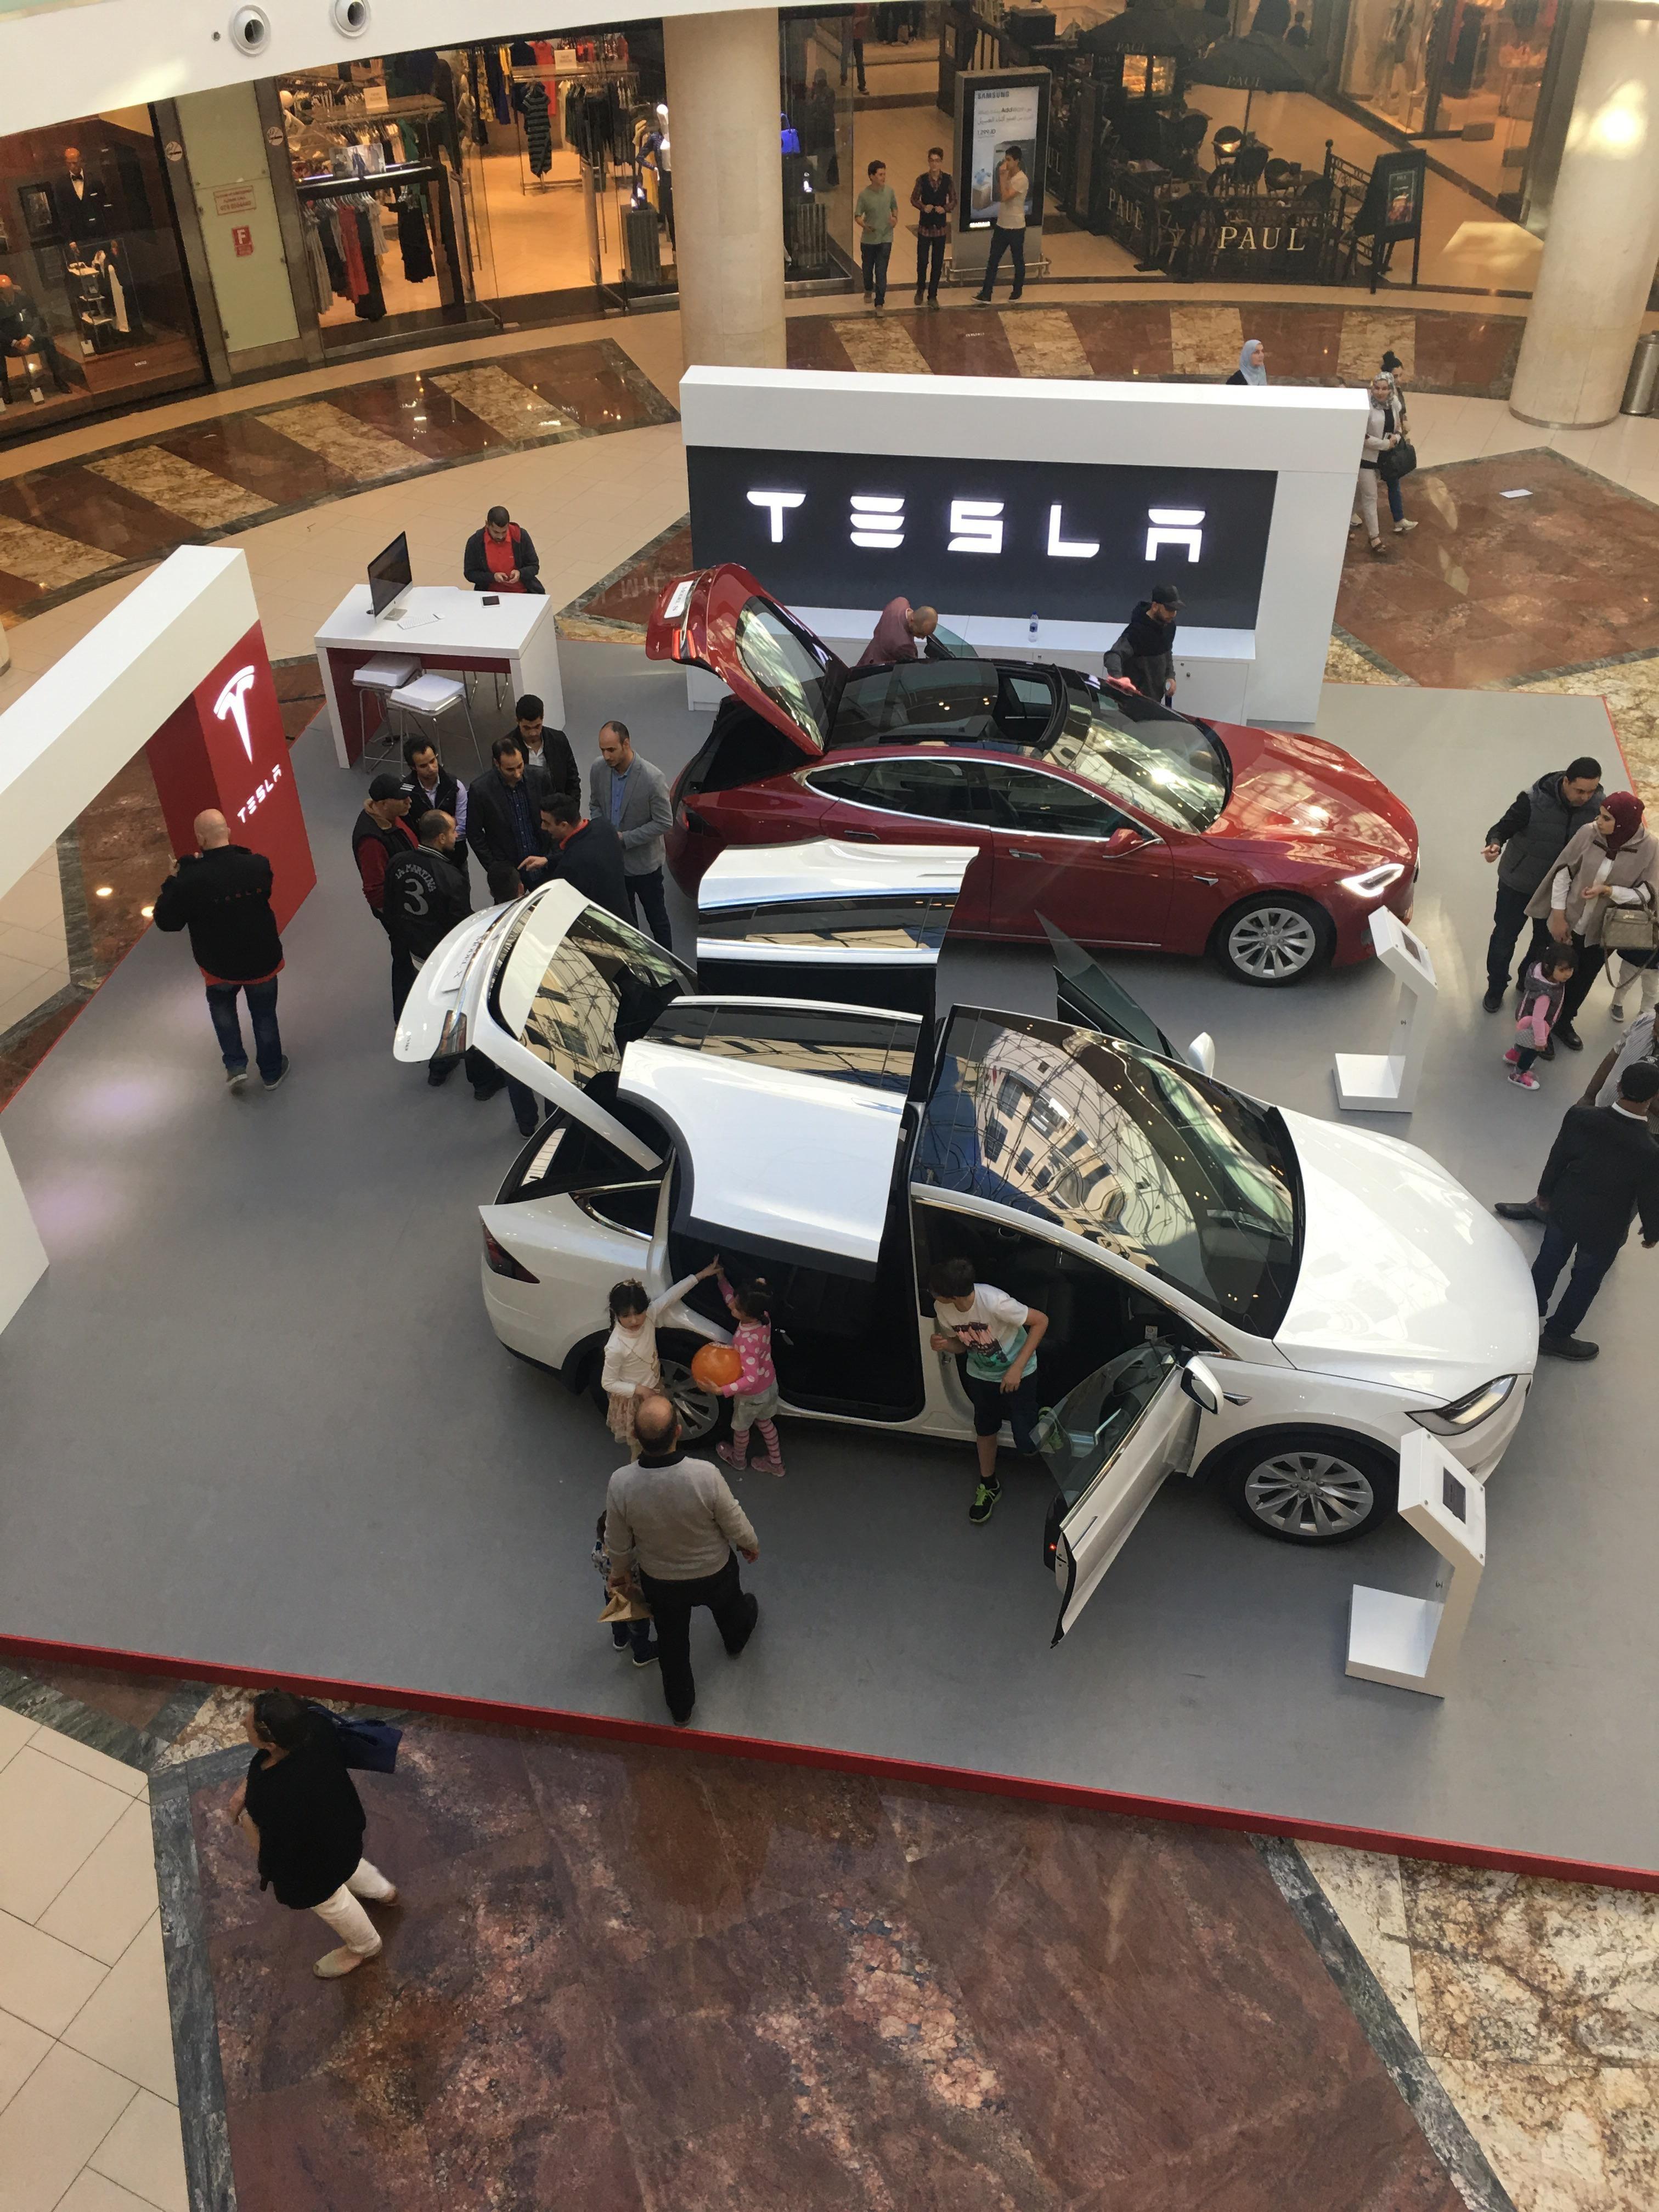 Pin by Cars & Motorcycles on Tesla | Tesla motors, Cars